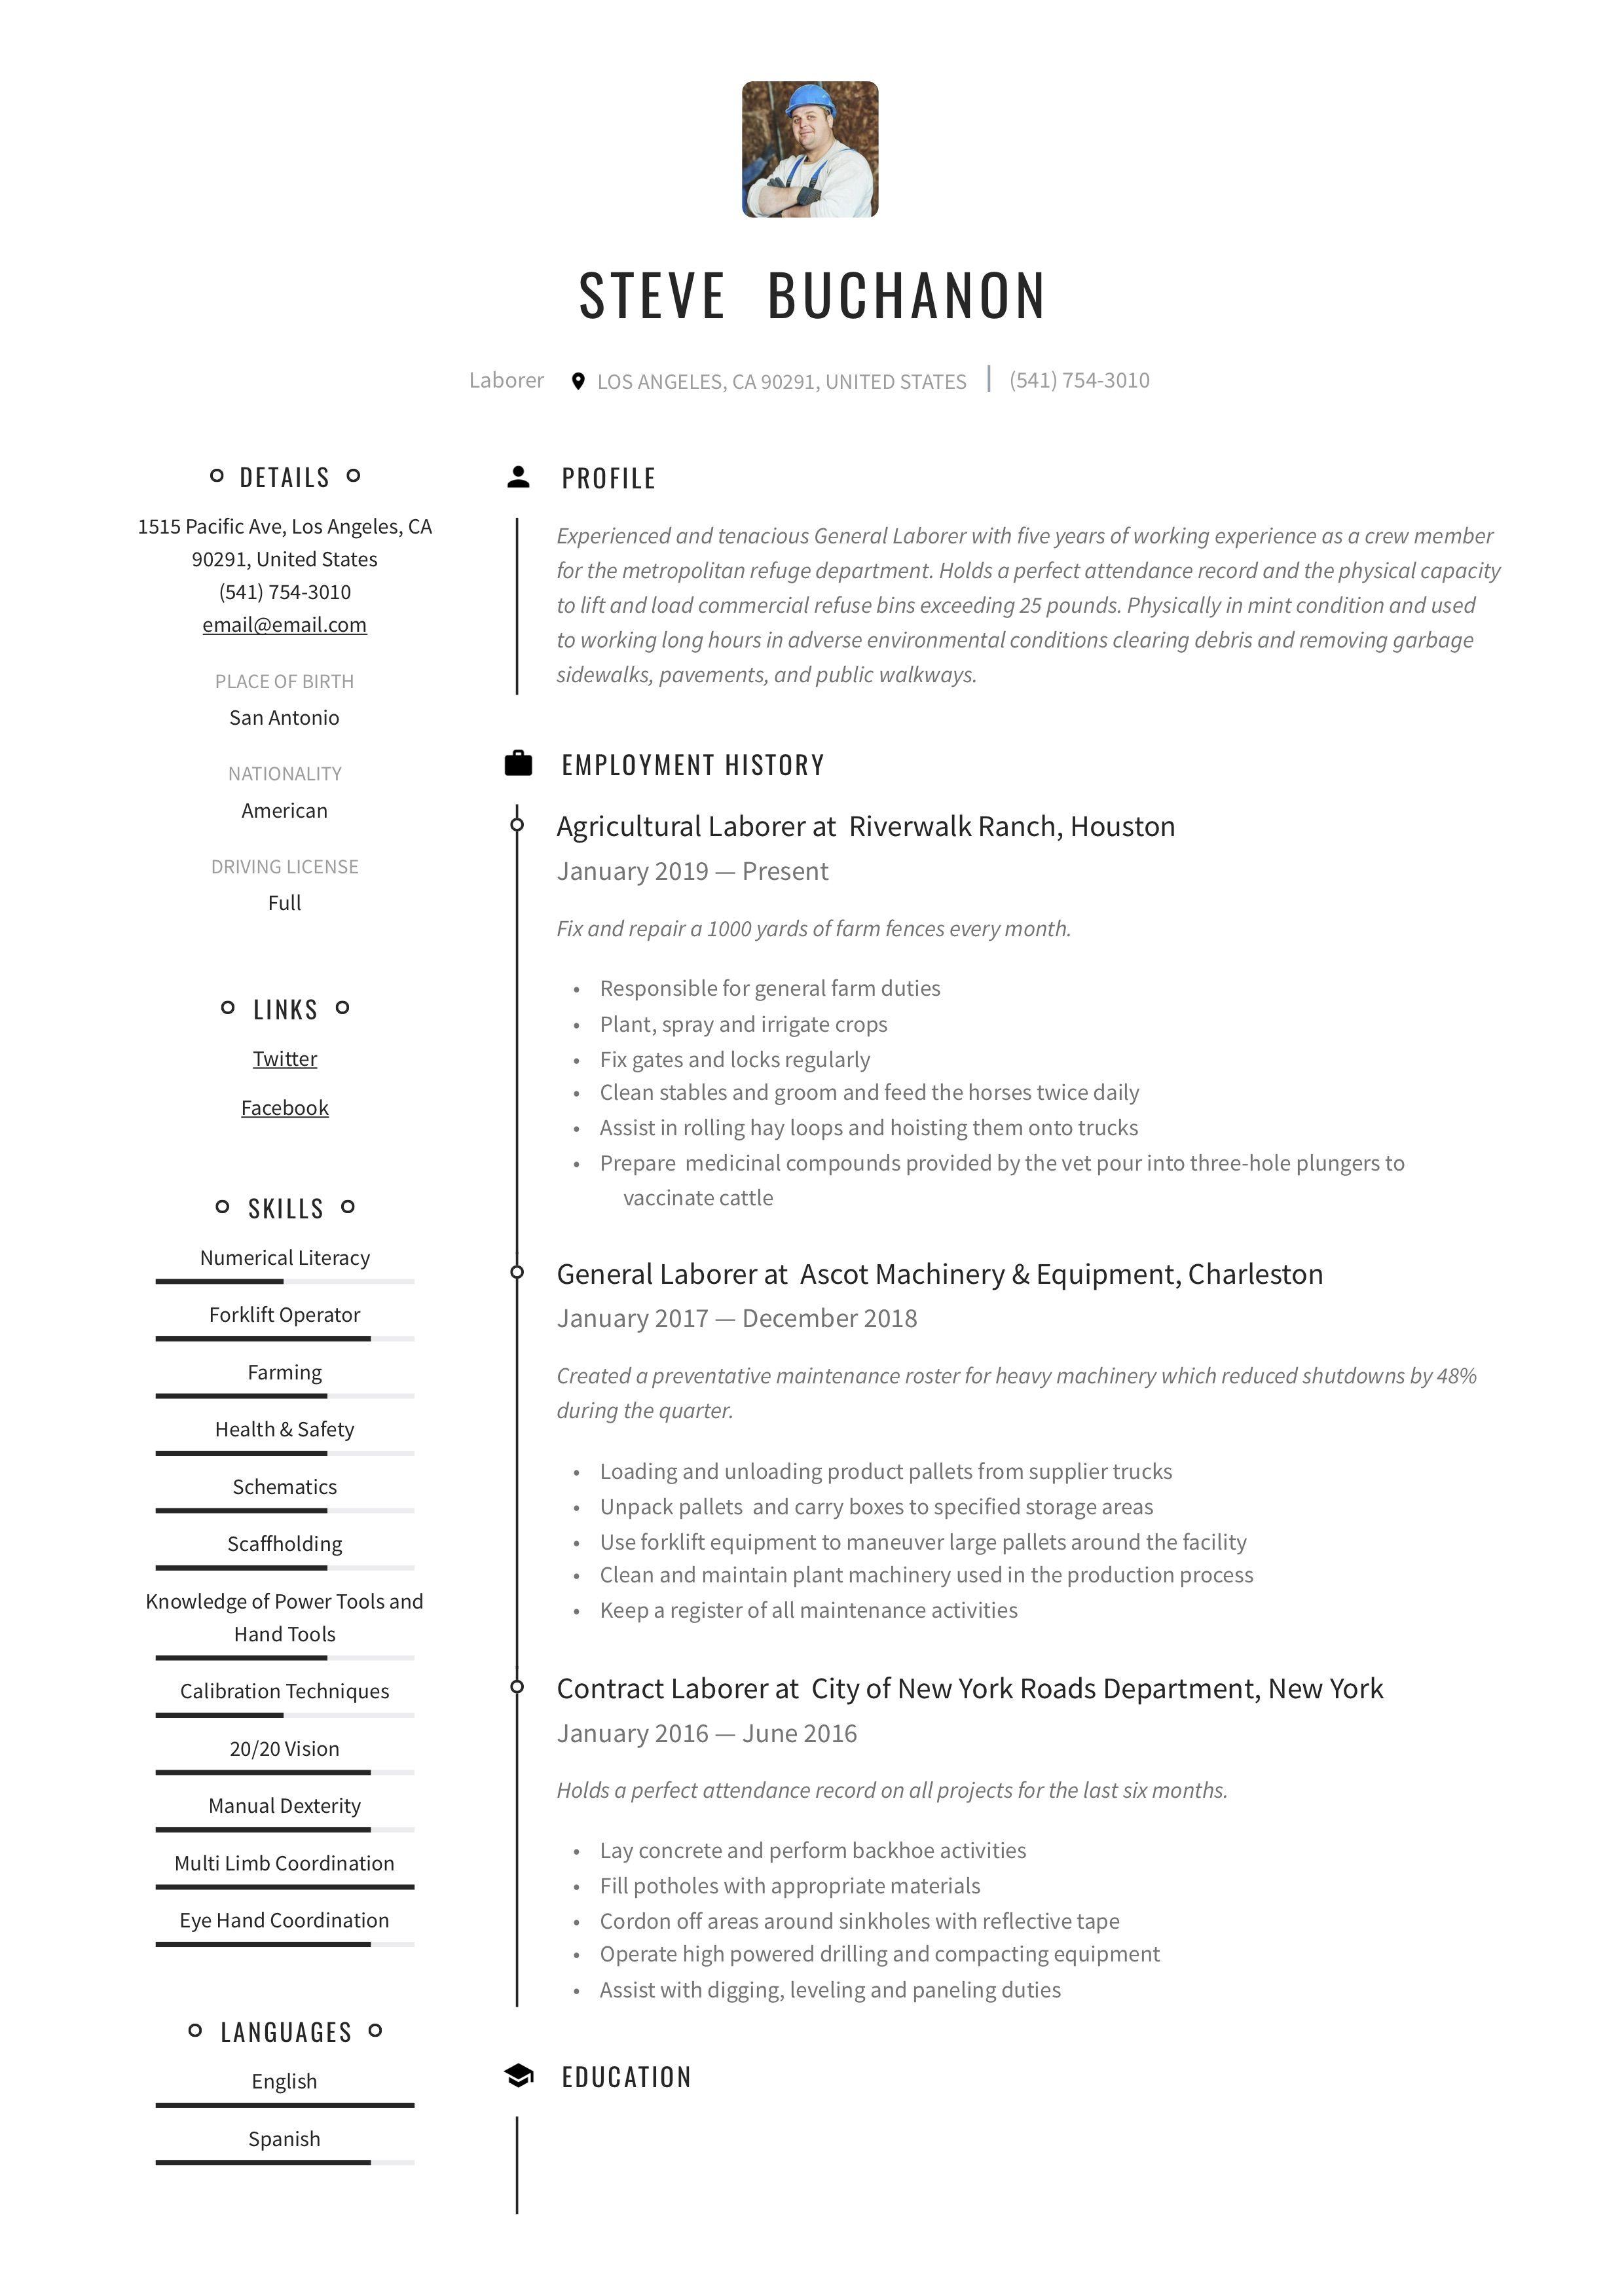 General Laborer Resume & Writing Guide in 2020 Resume